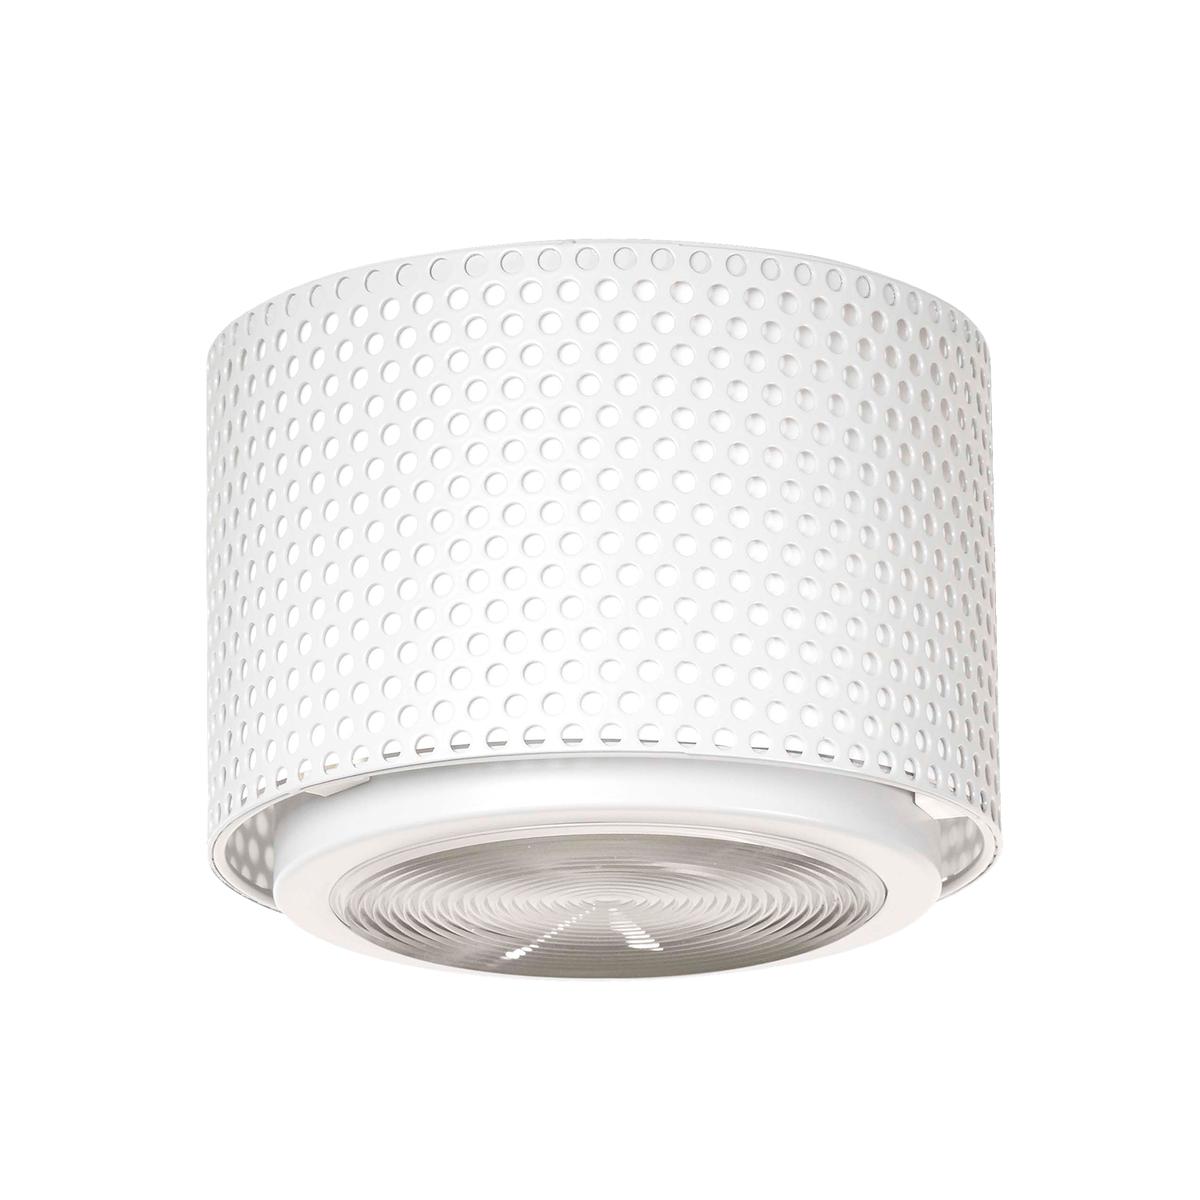 Sammode G13 Ceiling Lamp, Small, White